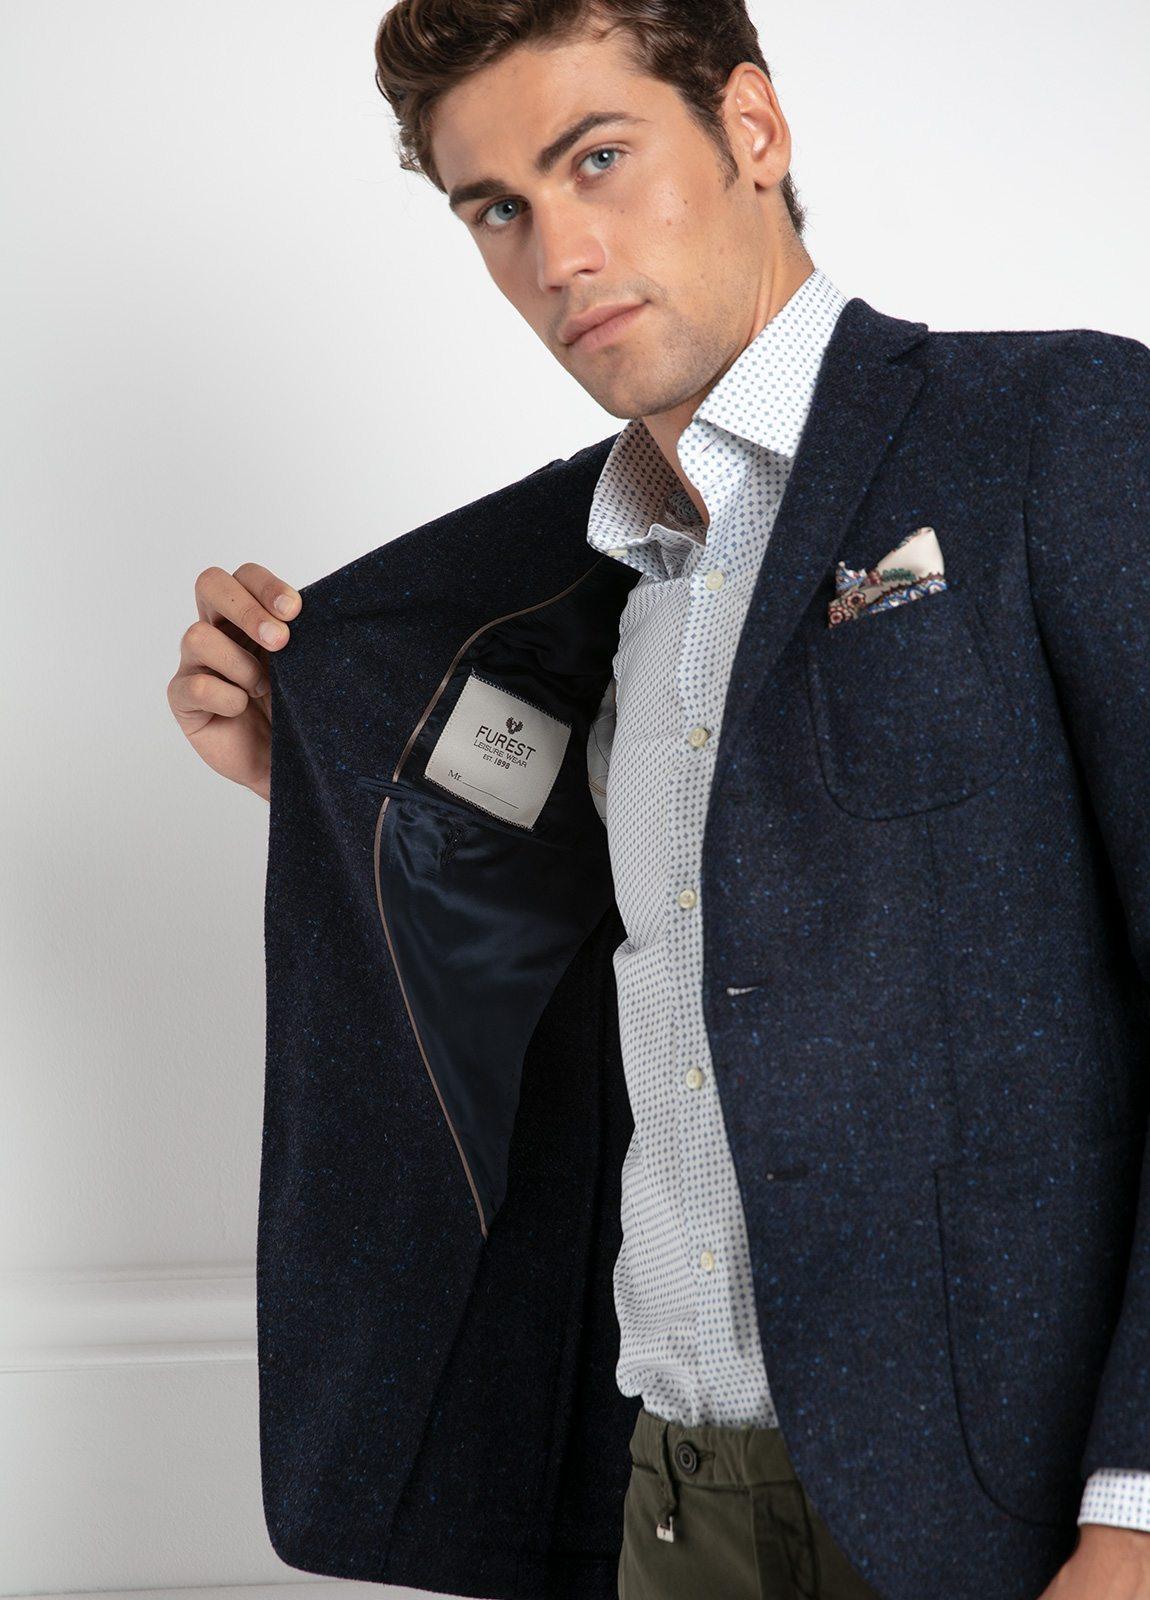 Americana SOFT JACKET Slim Fit, tejido textura color azul oscuro. 100% Lana. - Ítem2